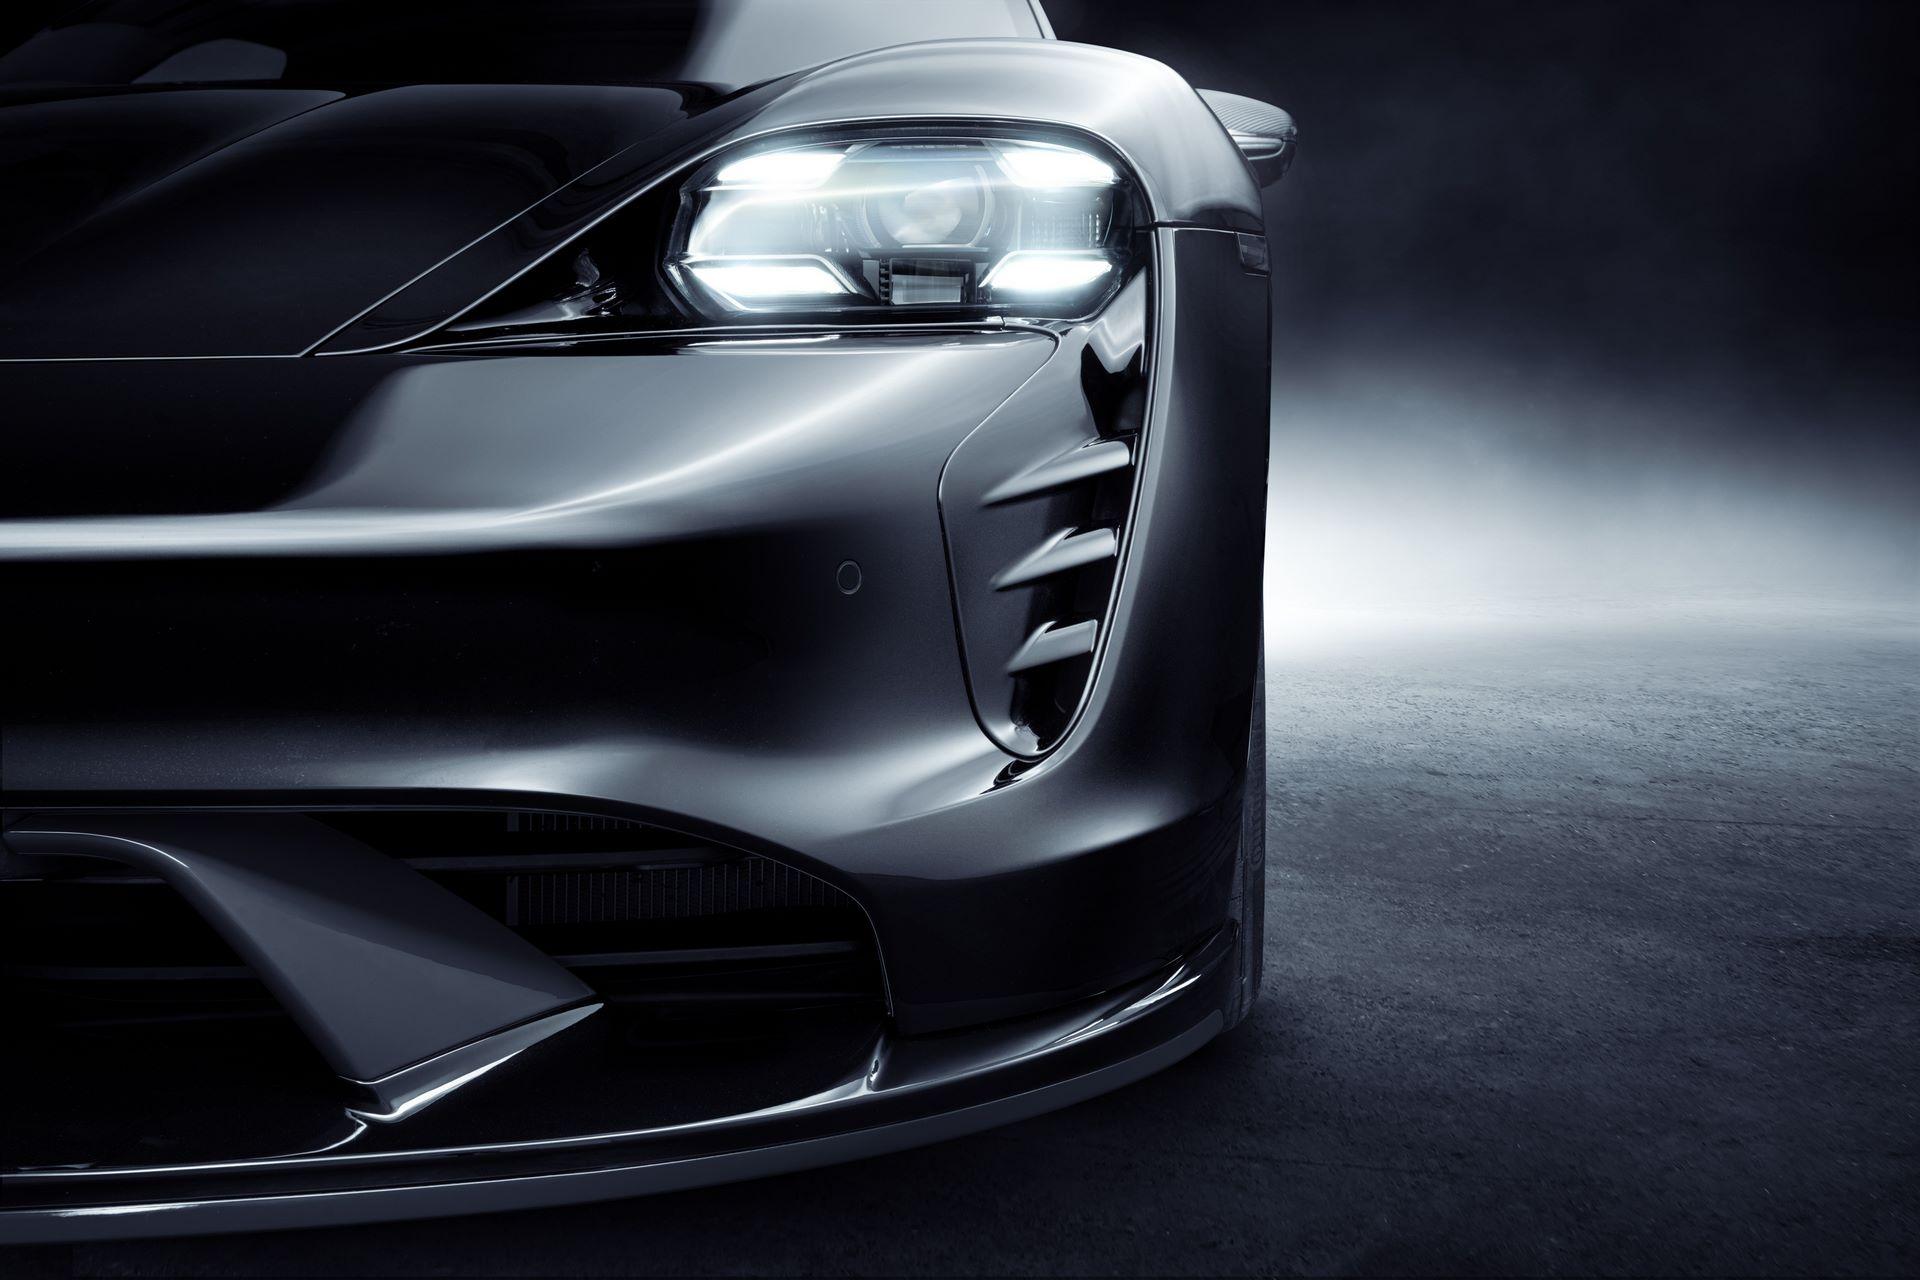 Porsche-Taycan-bodykit-by-TechArt-19